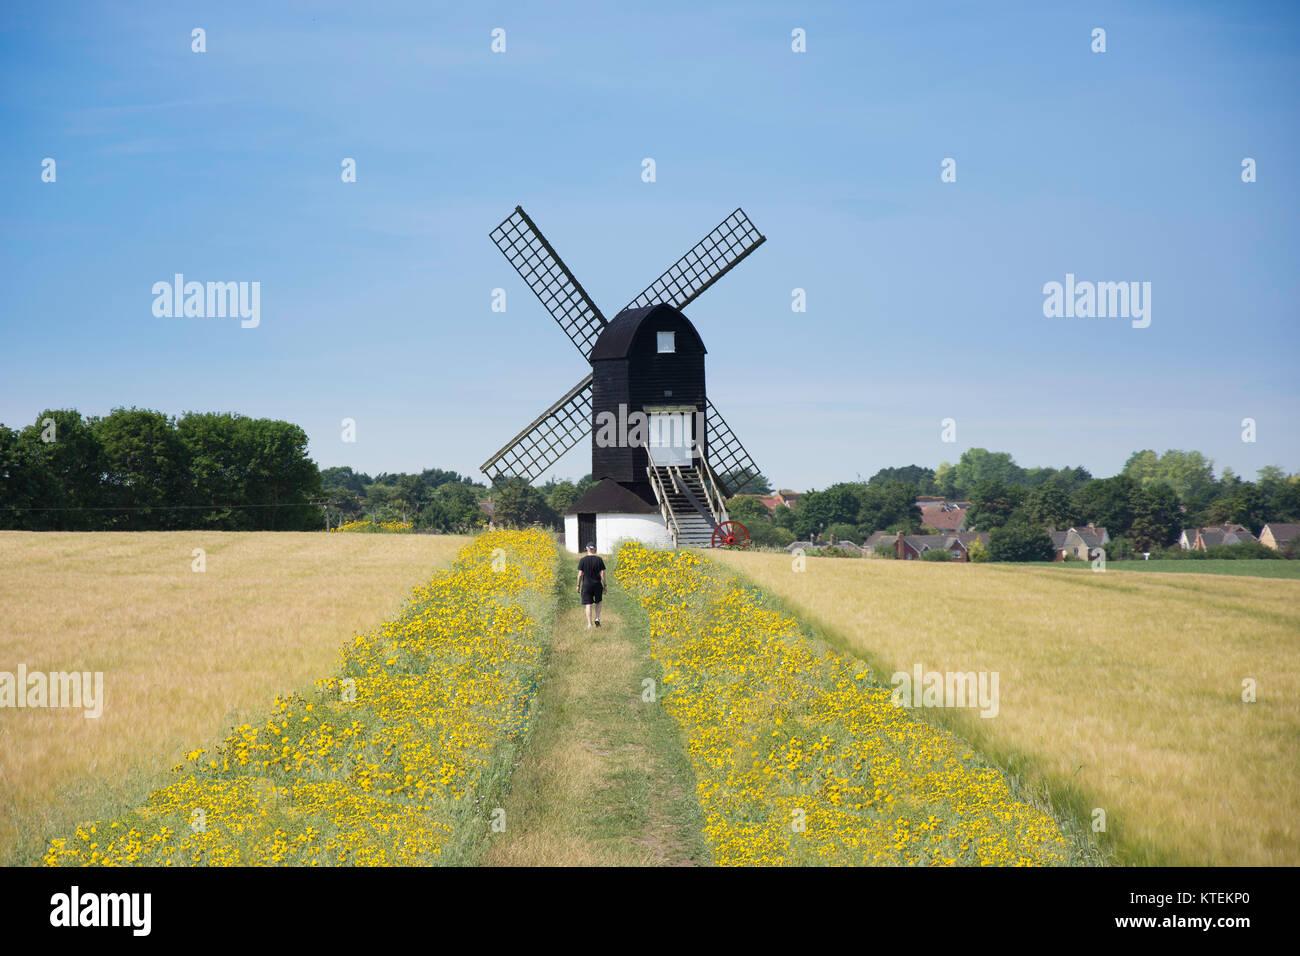 17th century The Pitstone Windmill, Pitstone, Buckinghamshire, England, United Kingdom - Stock Image